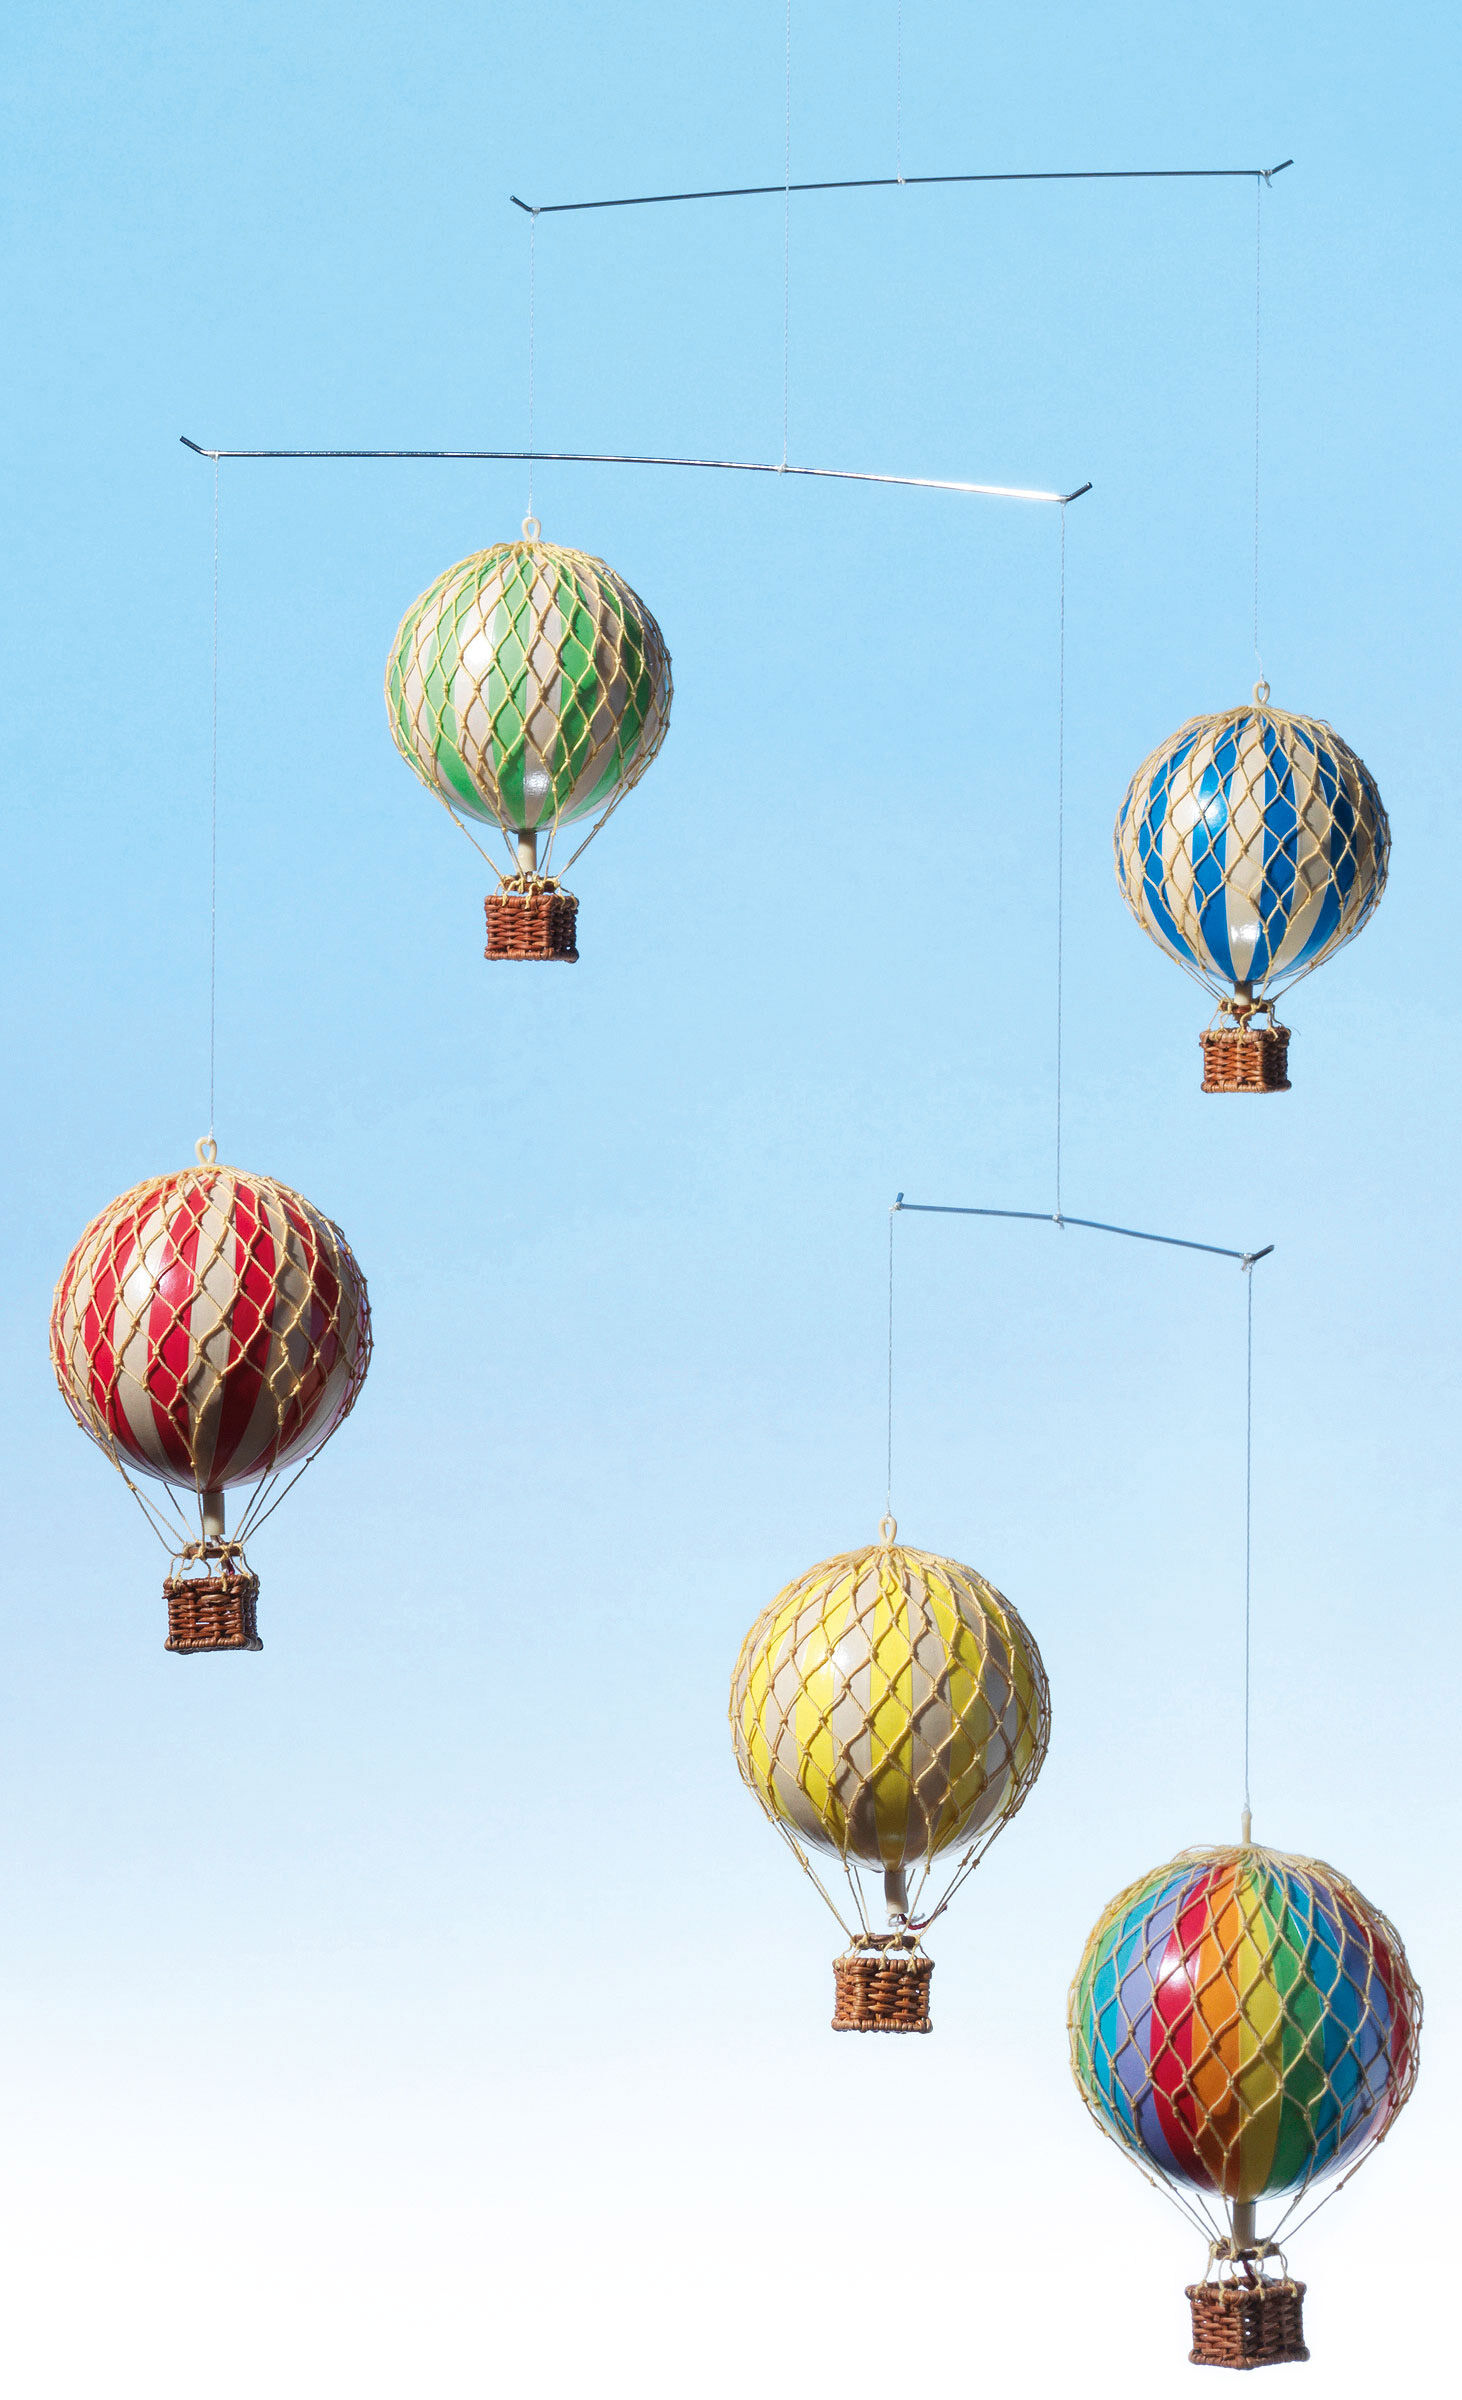 decken mobile hei luftballon ars mundi. Black Bedroom Furniture Sets. Home Design Ideas